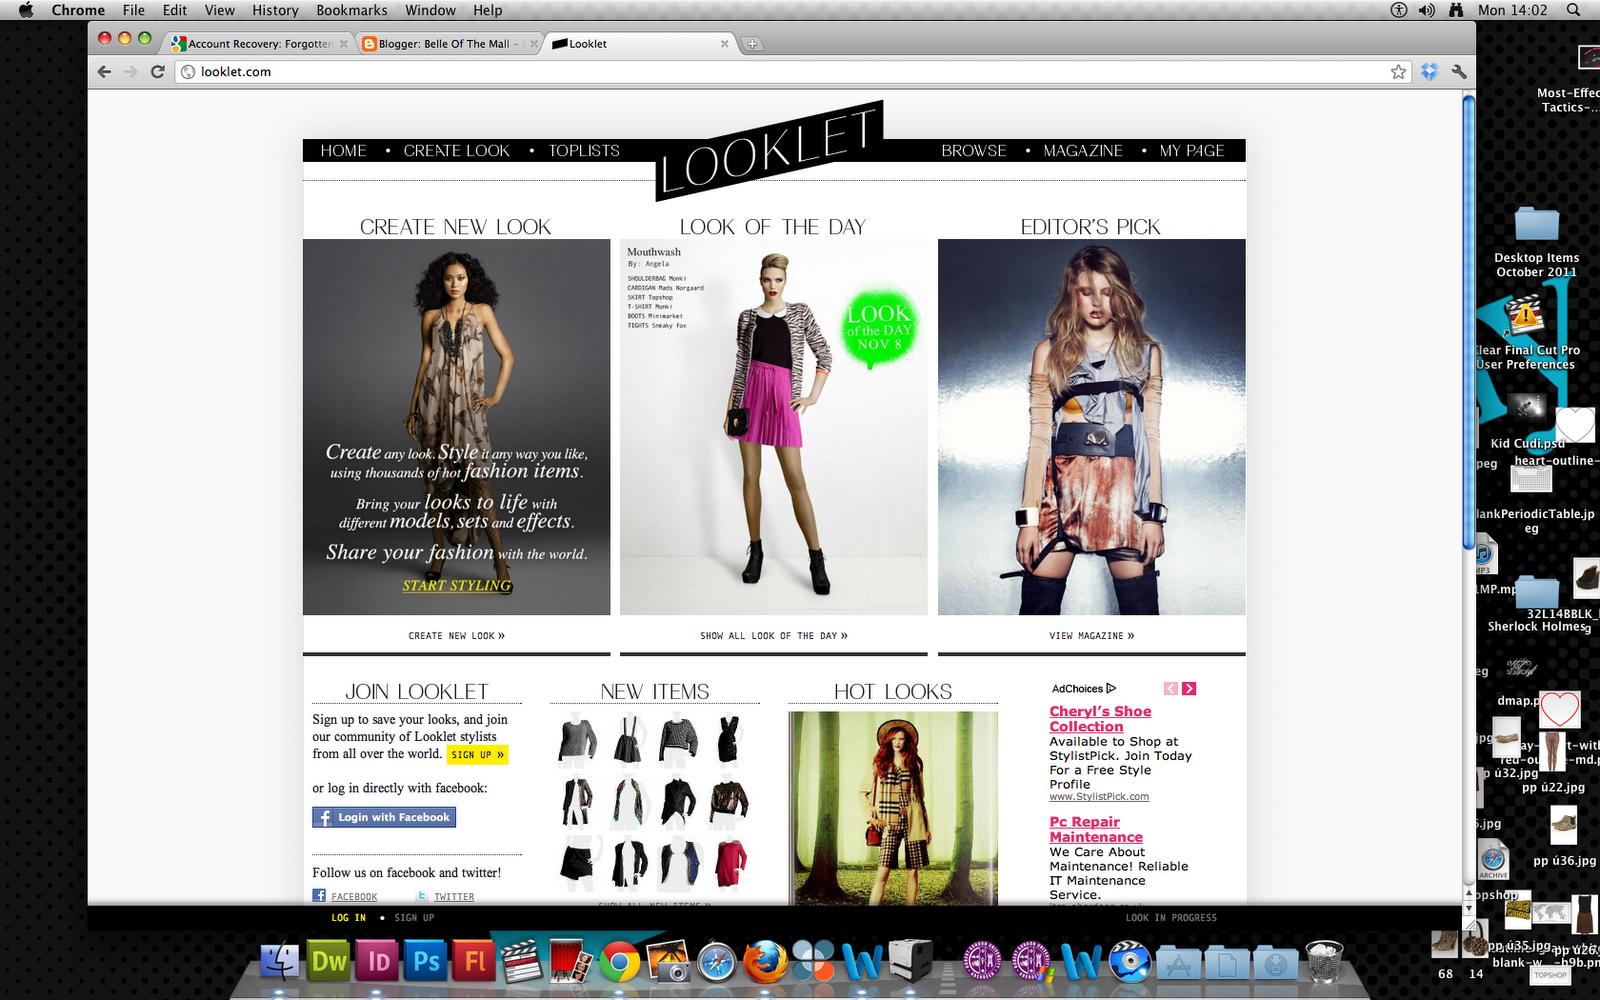 List of fashion items 25